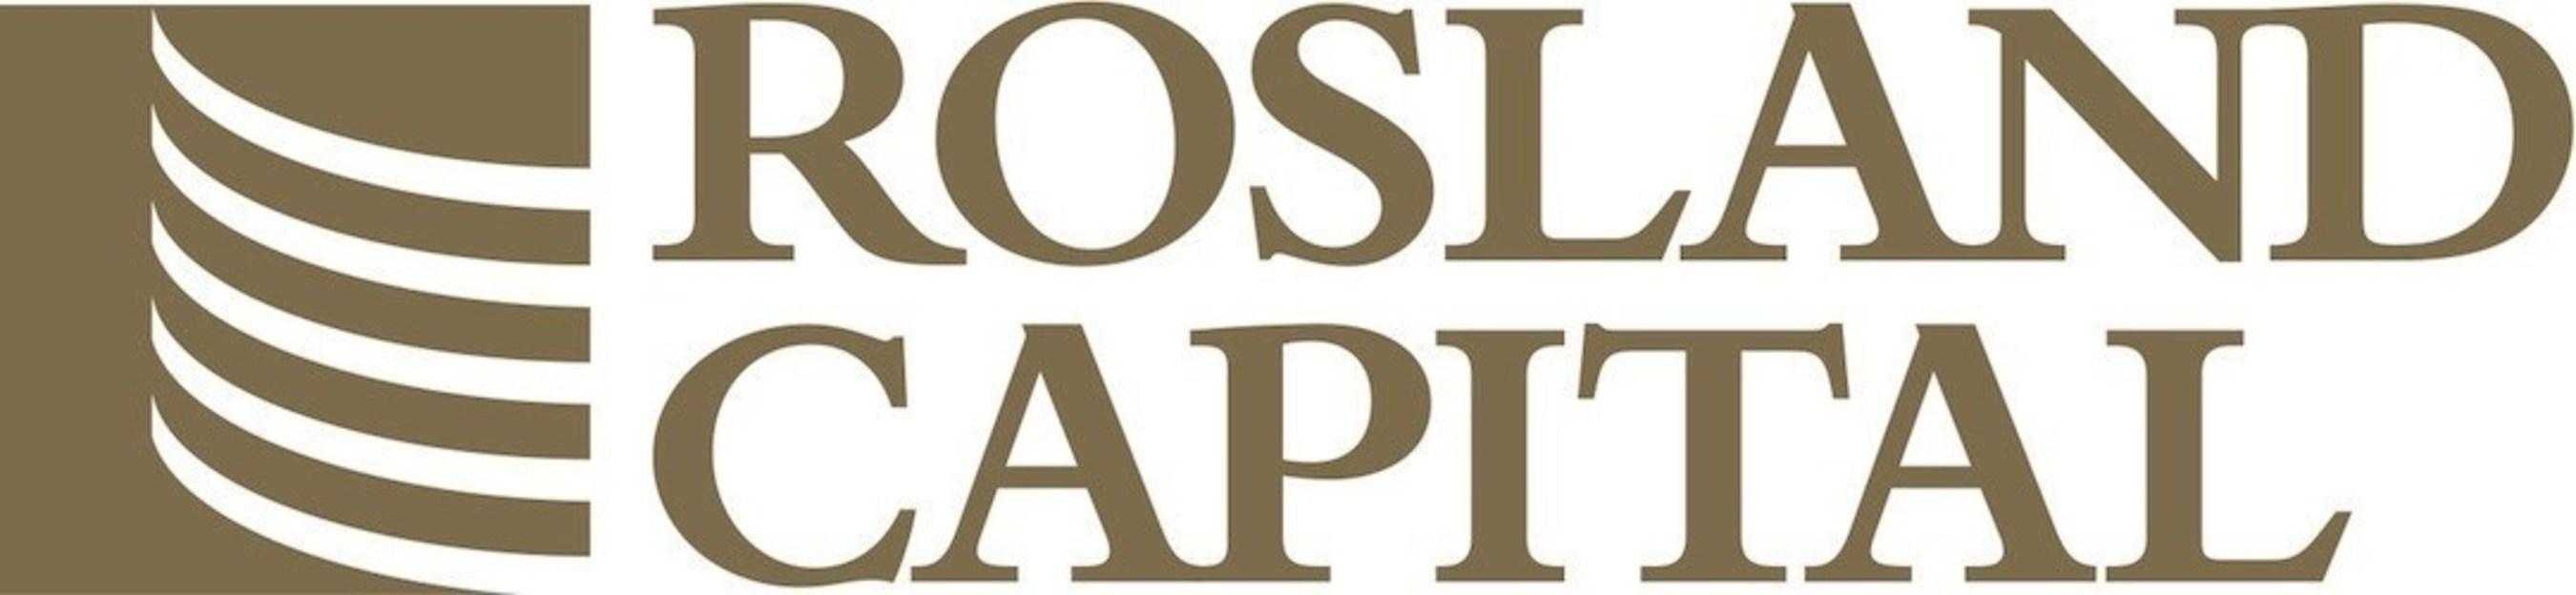 Rosland Capital Group logo